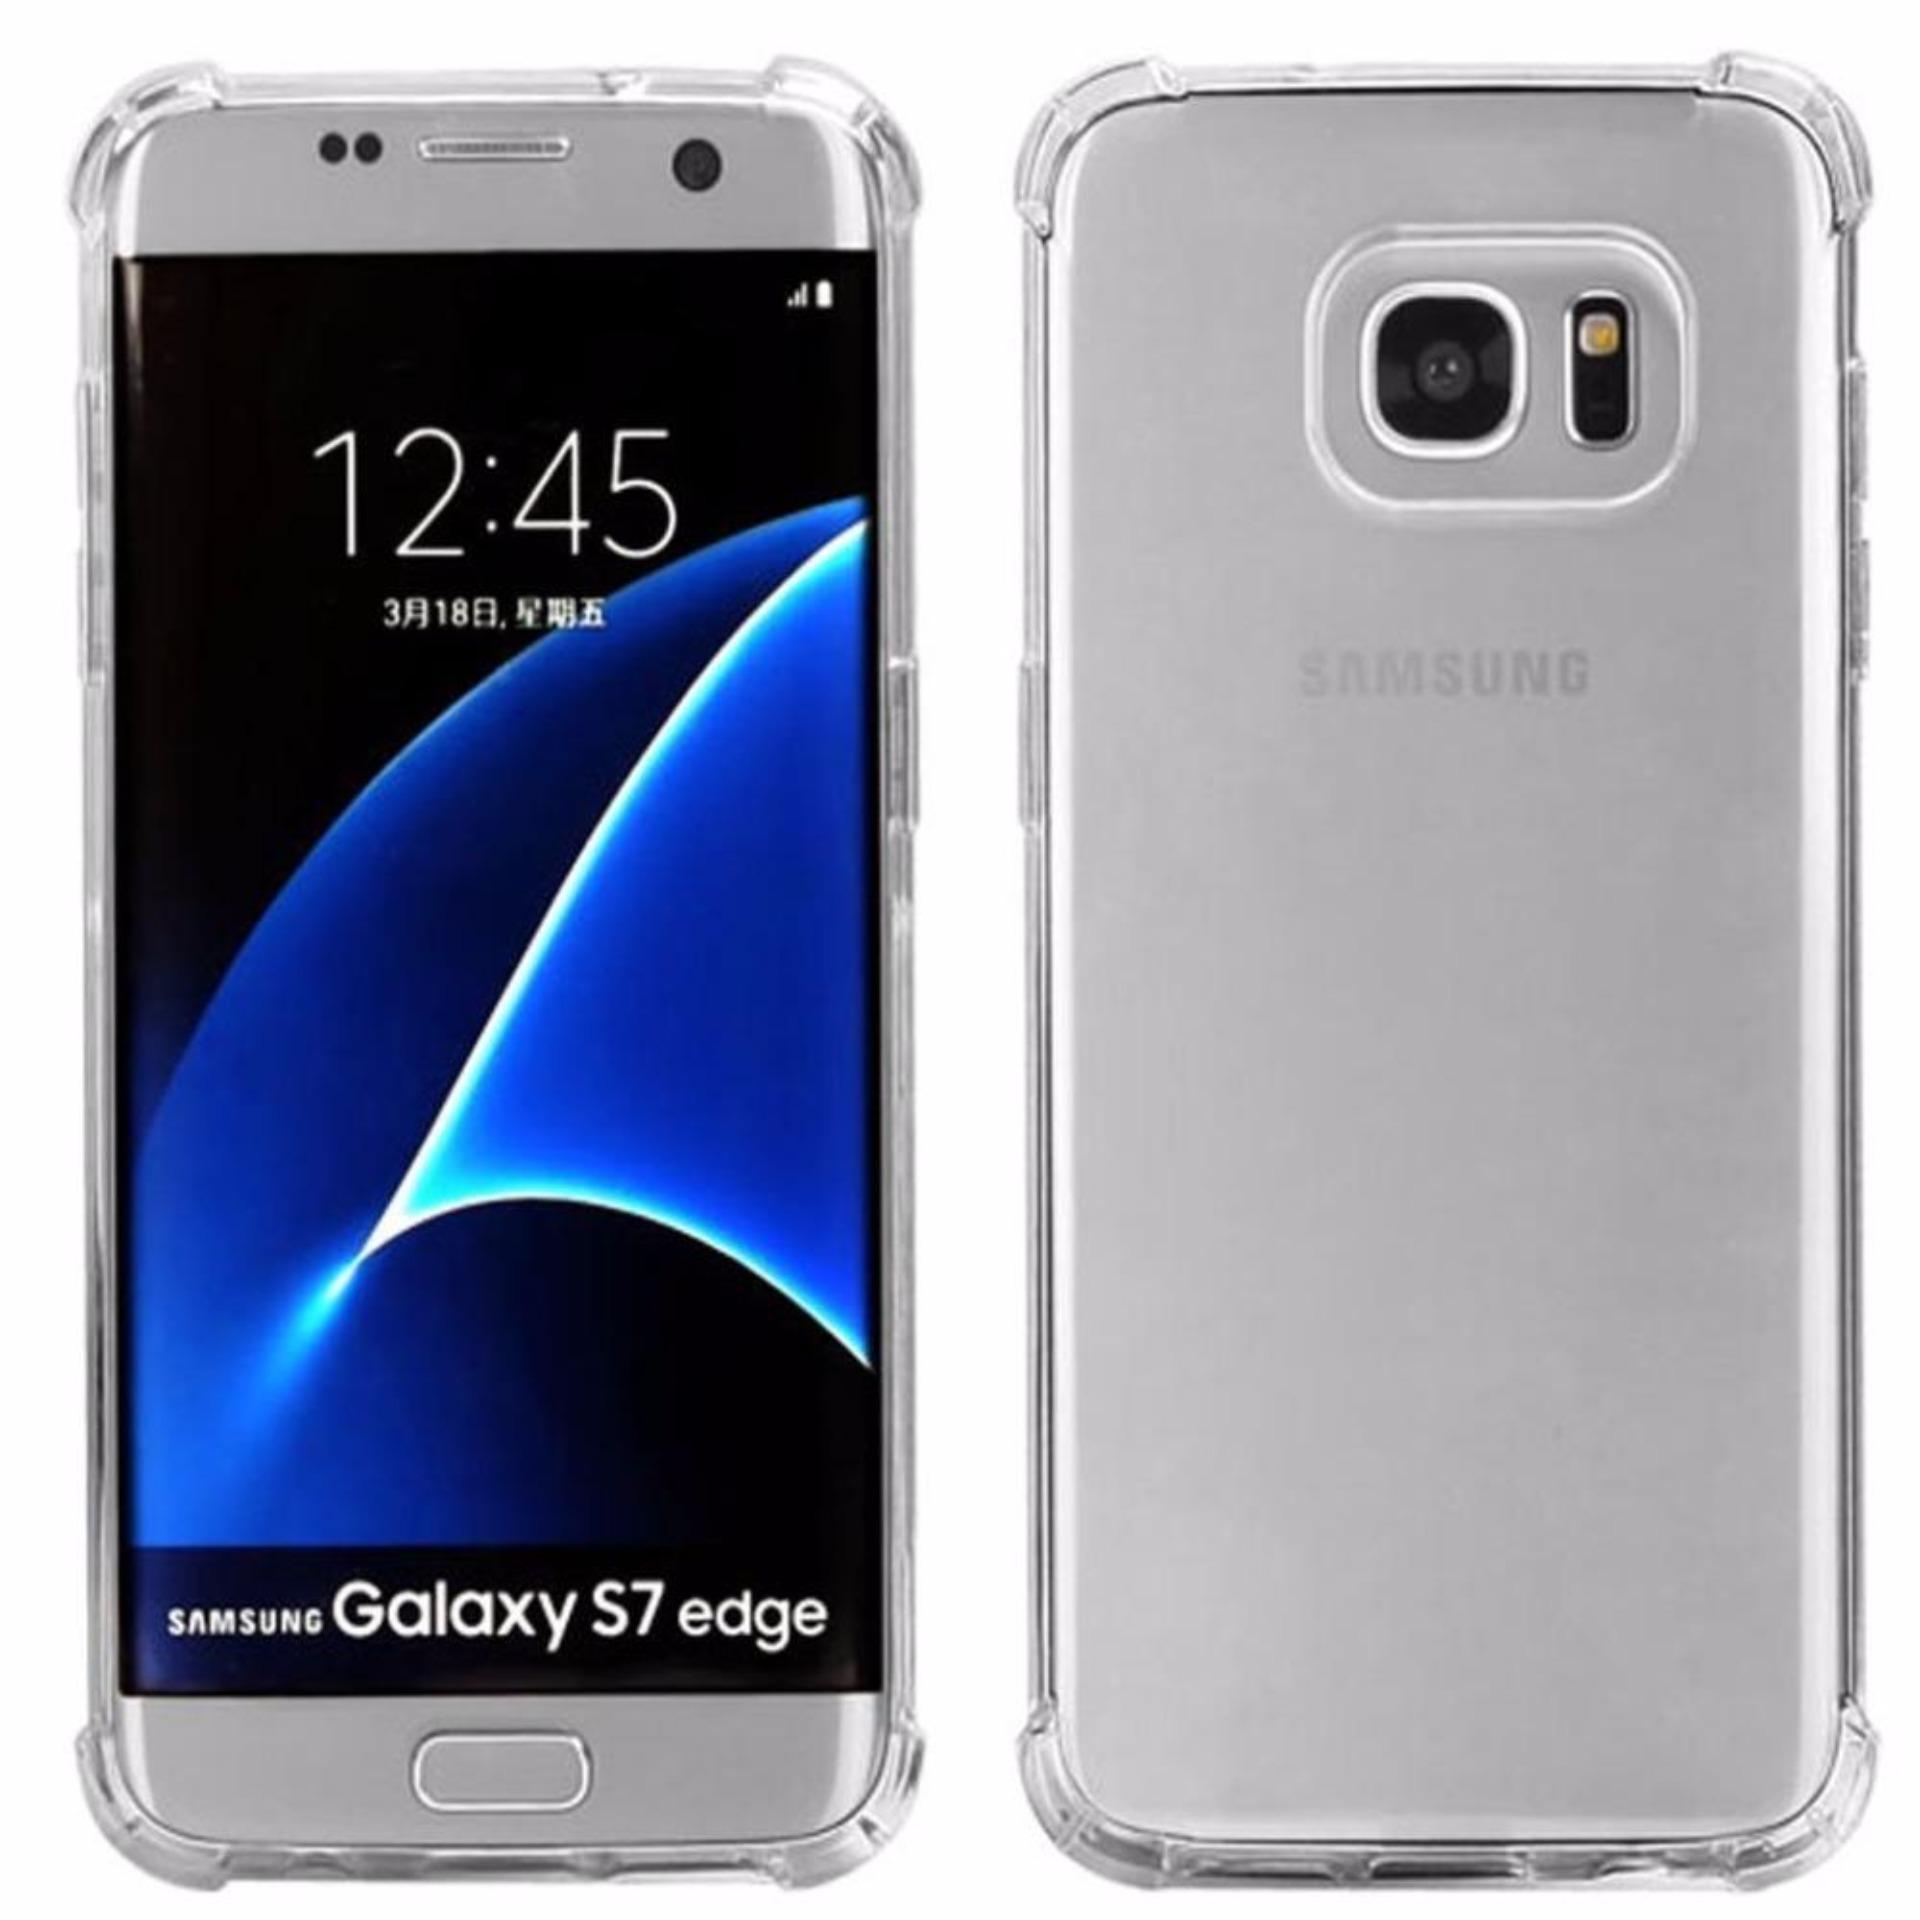 Cek Harga Baru Tpu Edge Samsung Galaxy S8 Plus G955 Duos Lte Anti Gores Shock Screen Protector S7 Full Depanbelakang Shockcase For G935 4g Premium